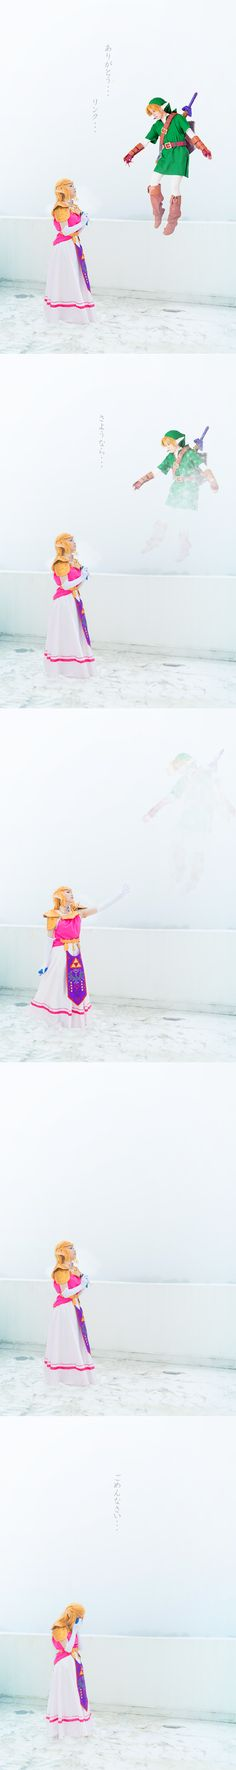 Ocarina of Time ending, by @yzk919 | #Zelda #OoT